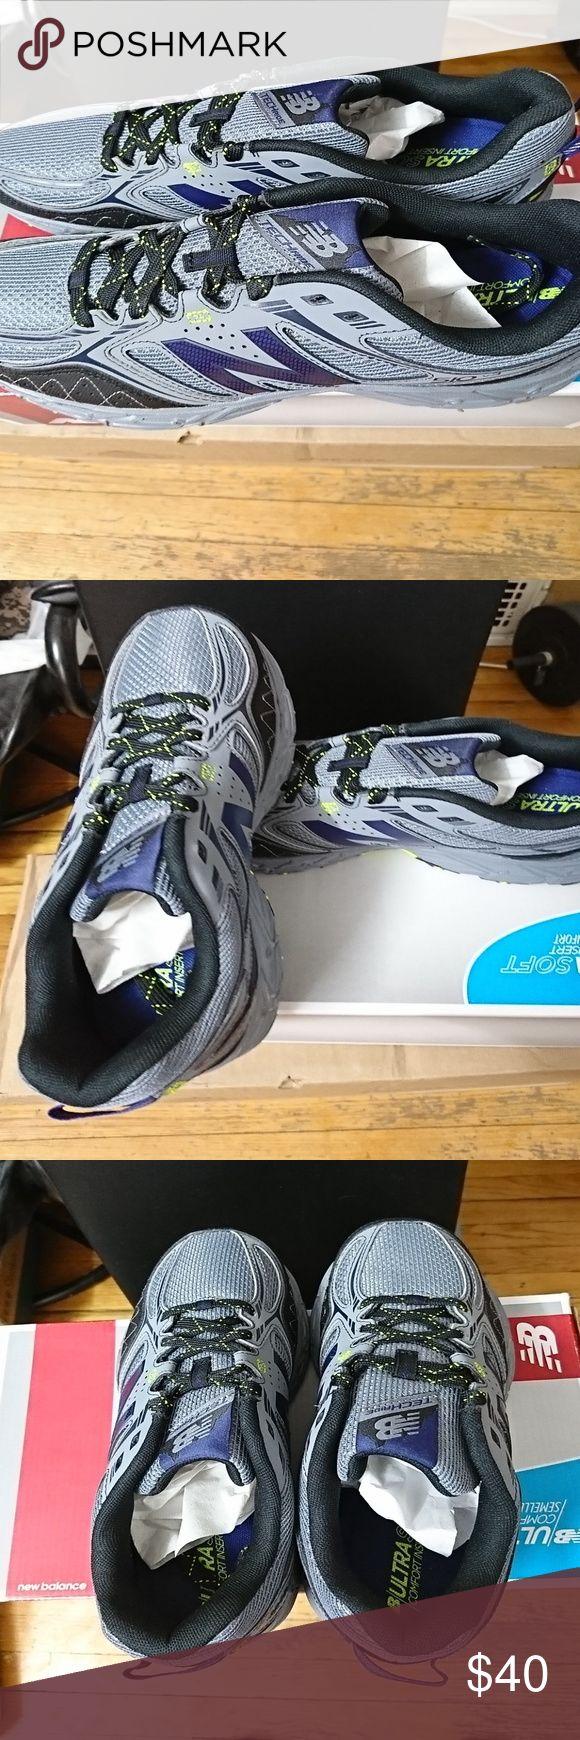 New Balance men's trail #running shoes Men's trail running shoes New Balance Shoes Athletic Shoes #trailrunningshoes #runningeveryday